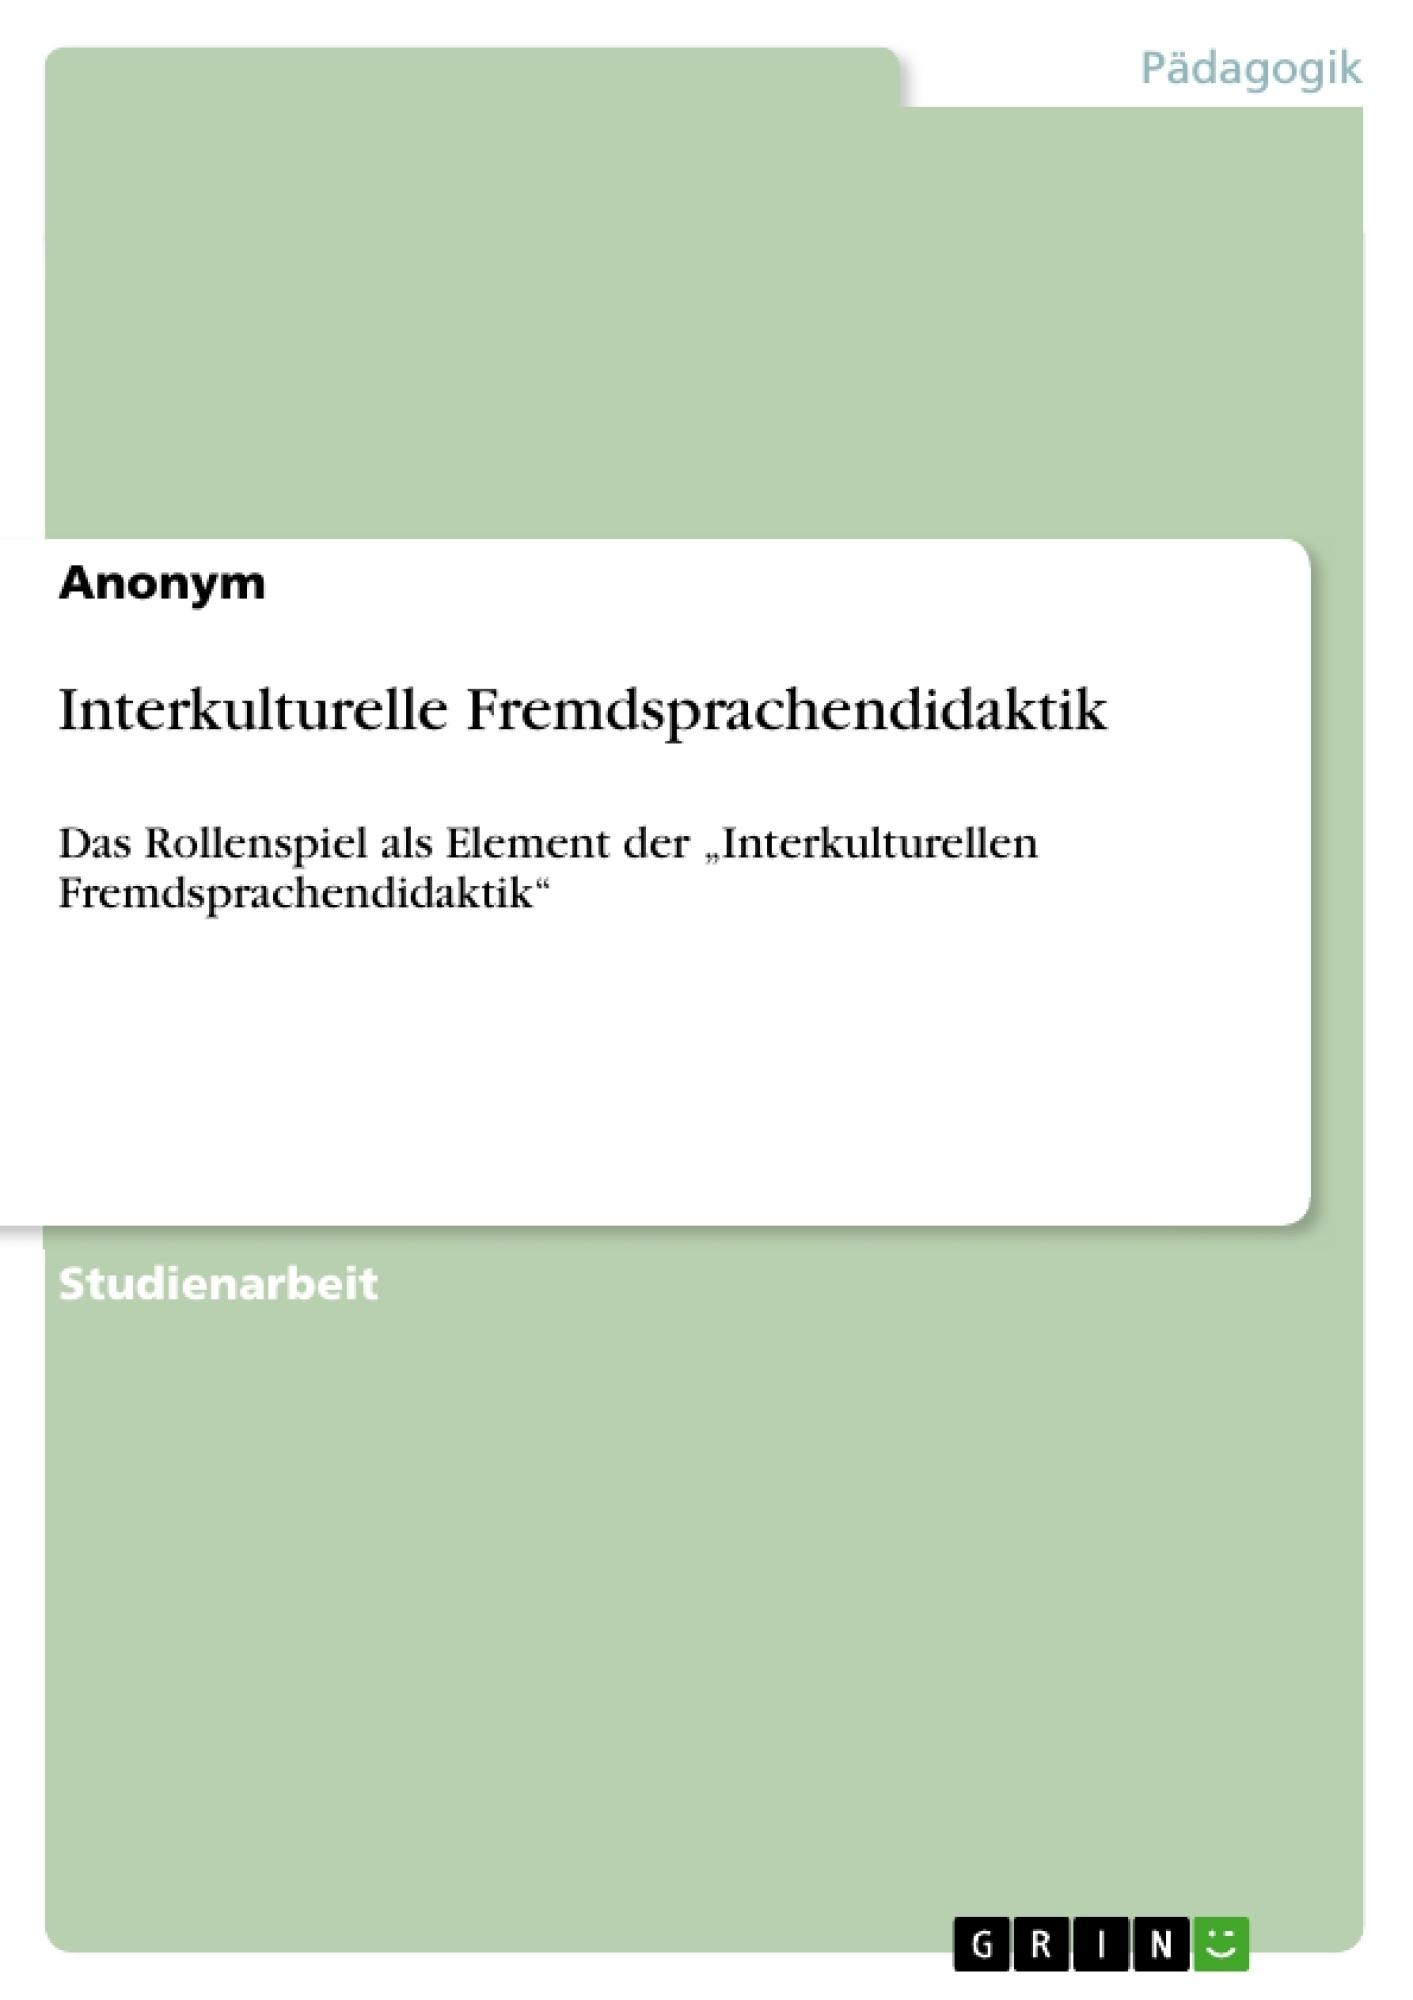 Titel: Interkulturelle Fremdsprachendidaktik